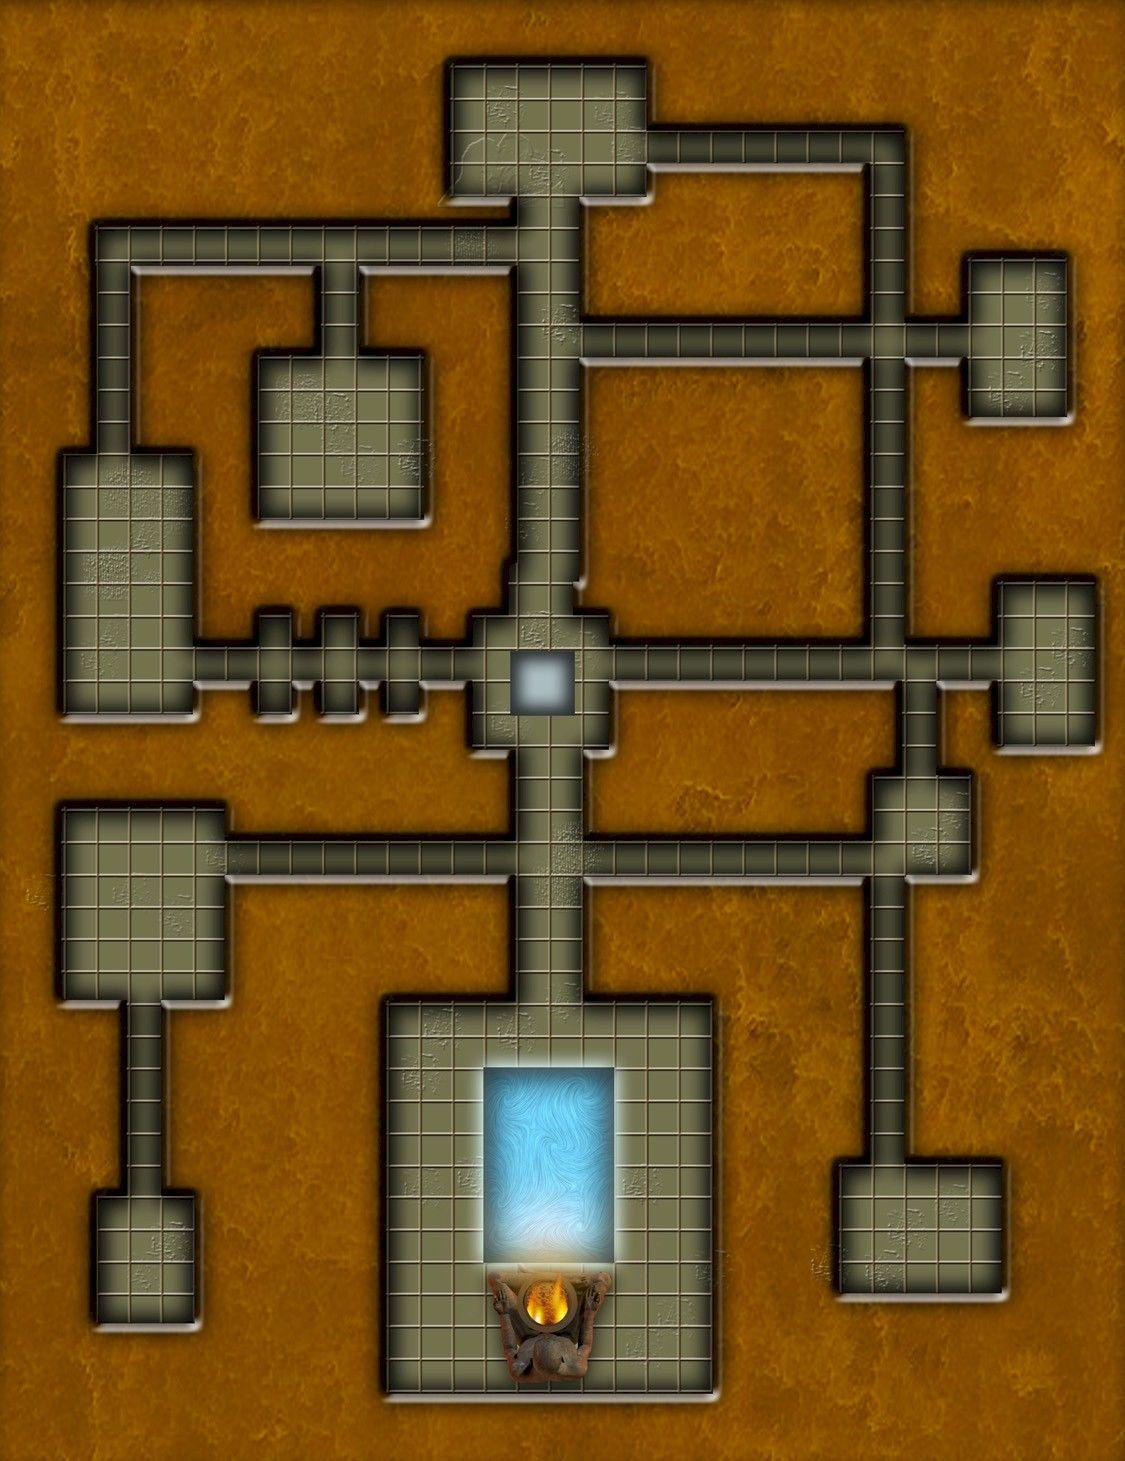 http://www.wizards.com/dnd/images/mapofweek/maincatacomblower_150dpi.jpg